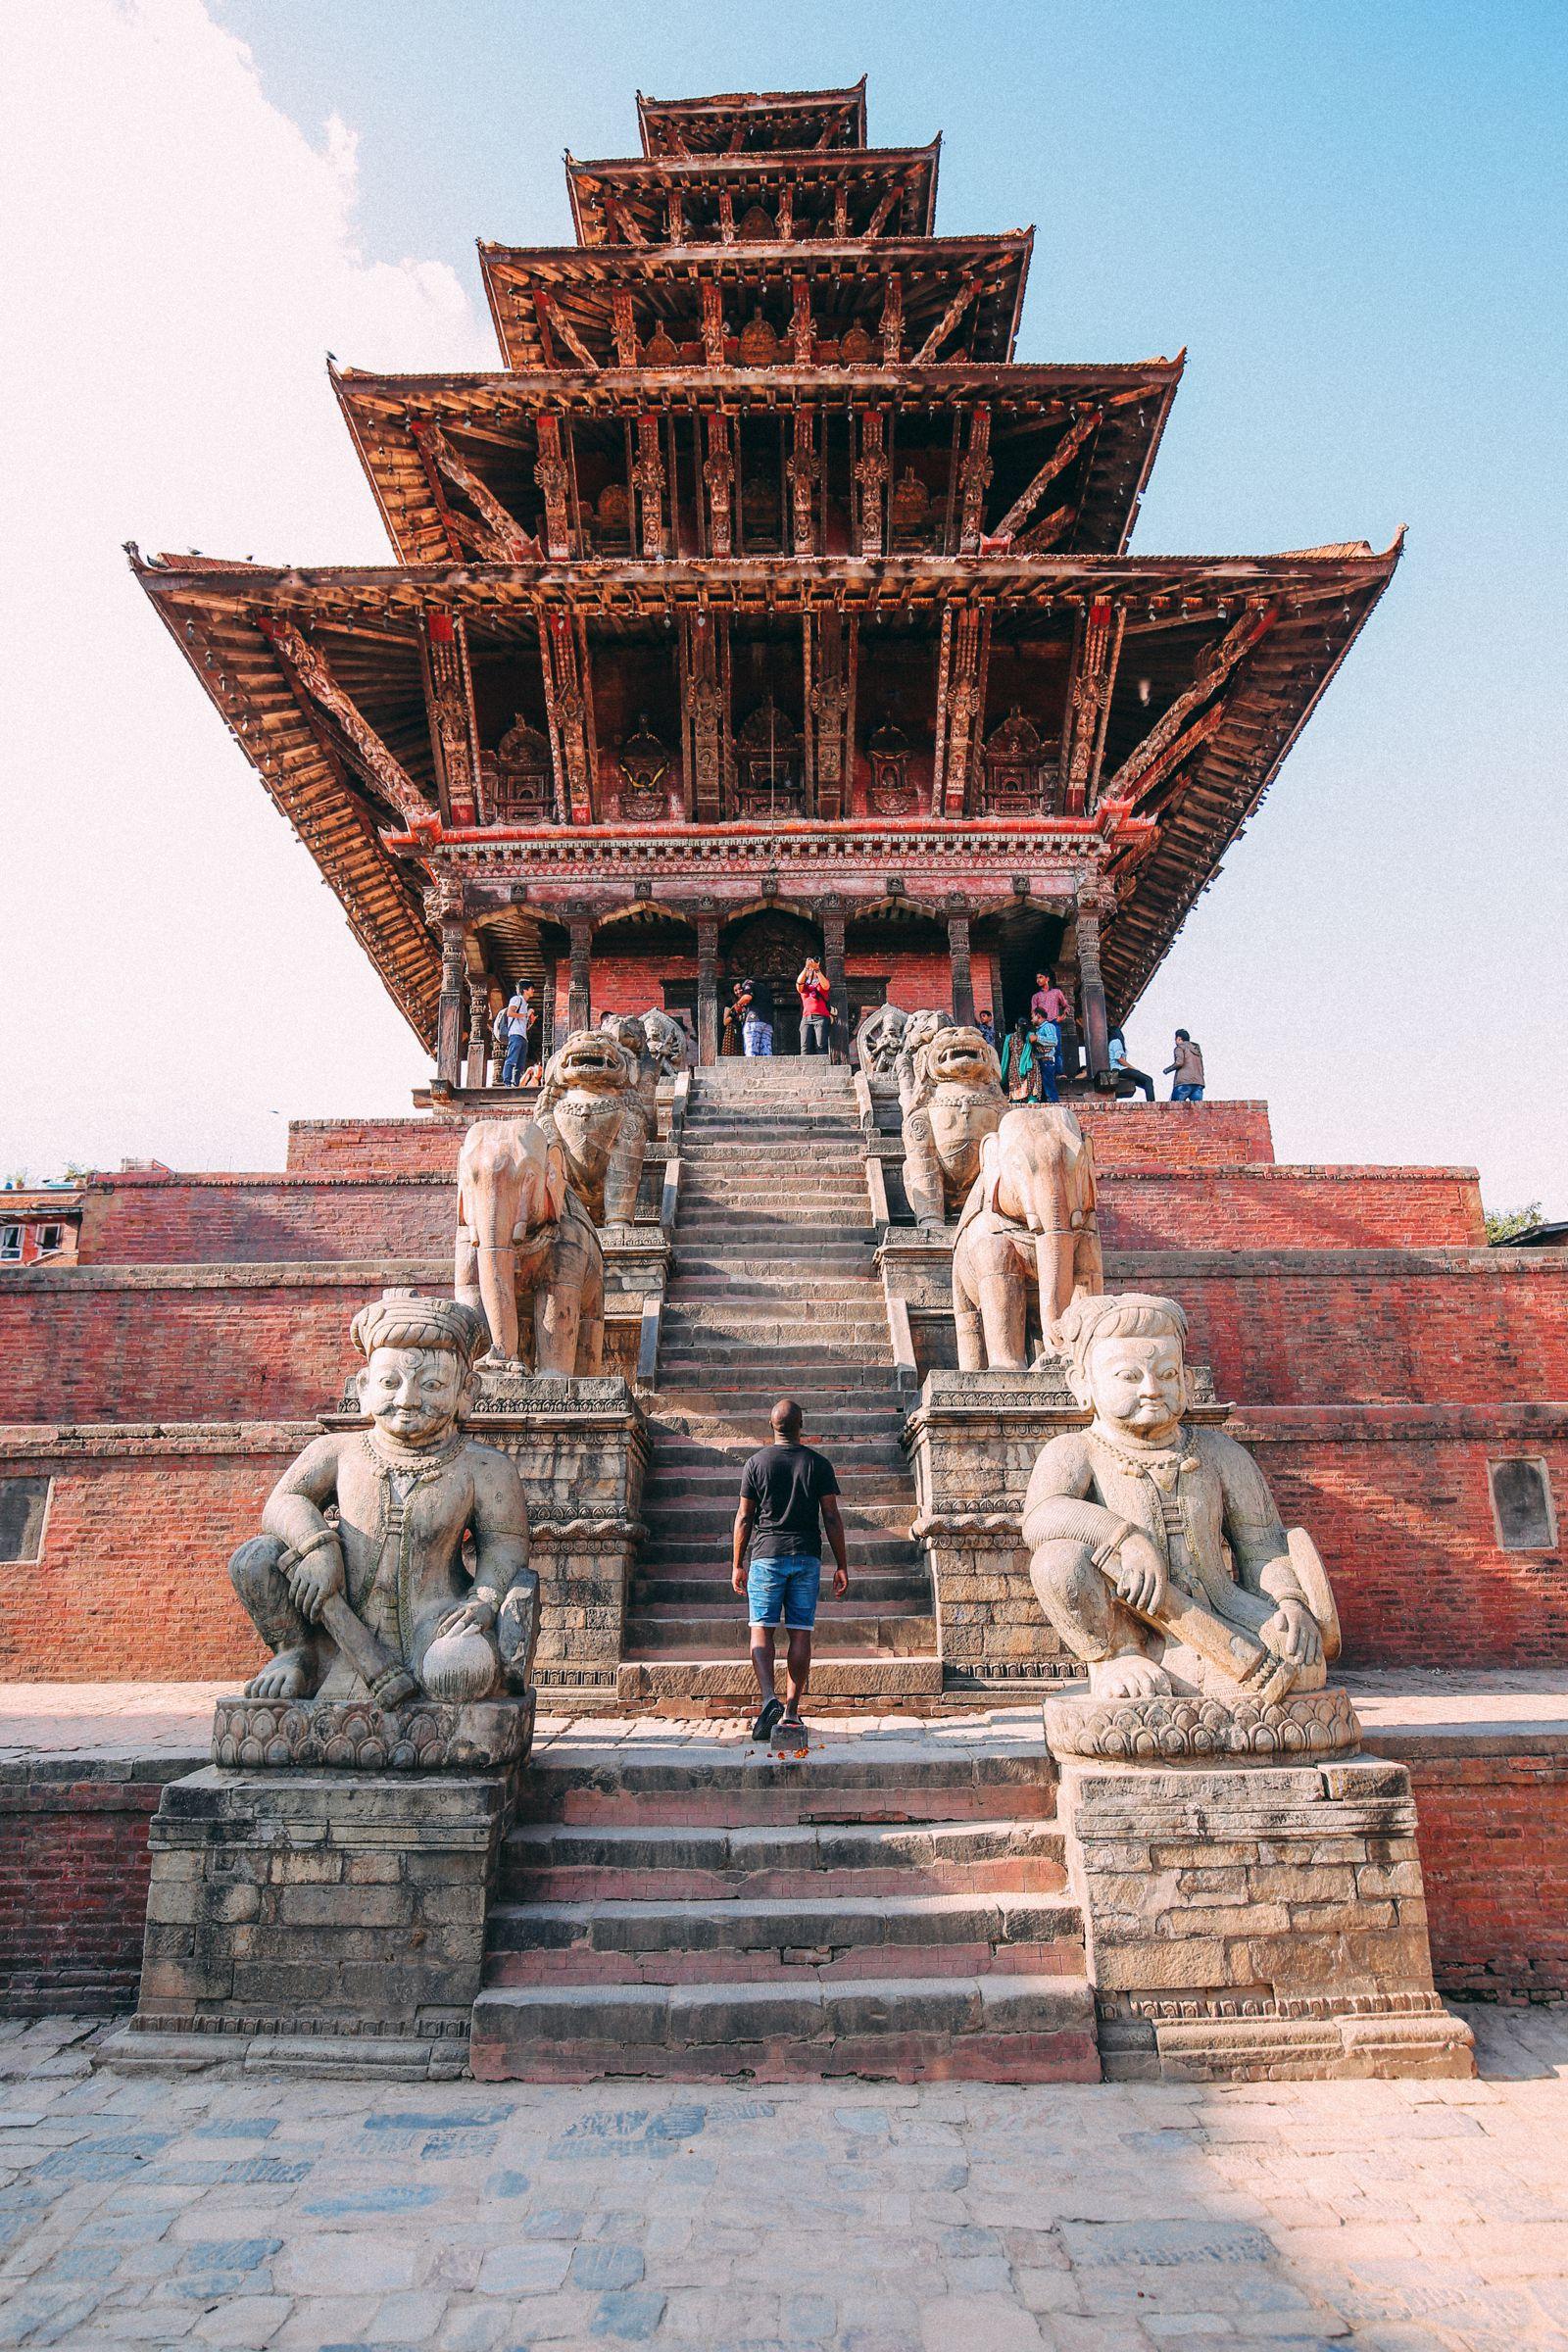 Photos And Postcards From Nepal... Chitwan, Kathmandu, Bhaktapur, Panauti, Pokhara, Tansen, Palpa, Lumbini (6)